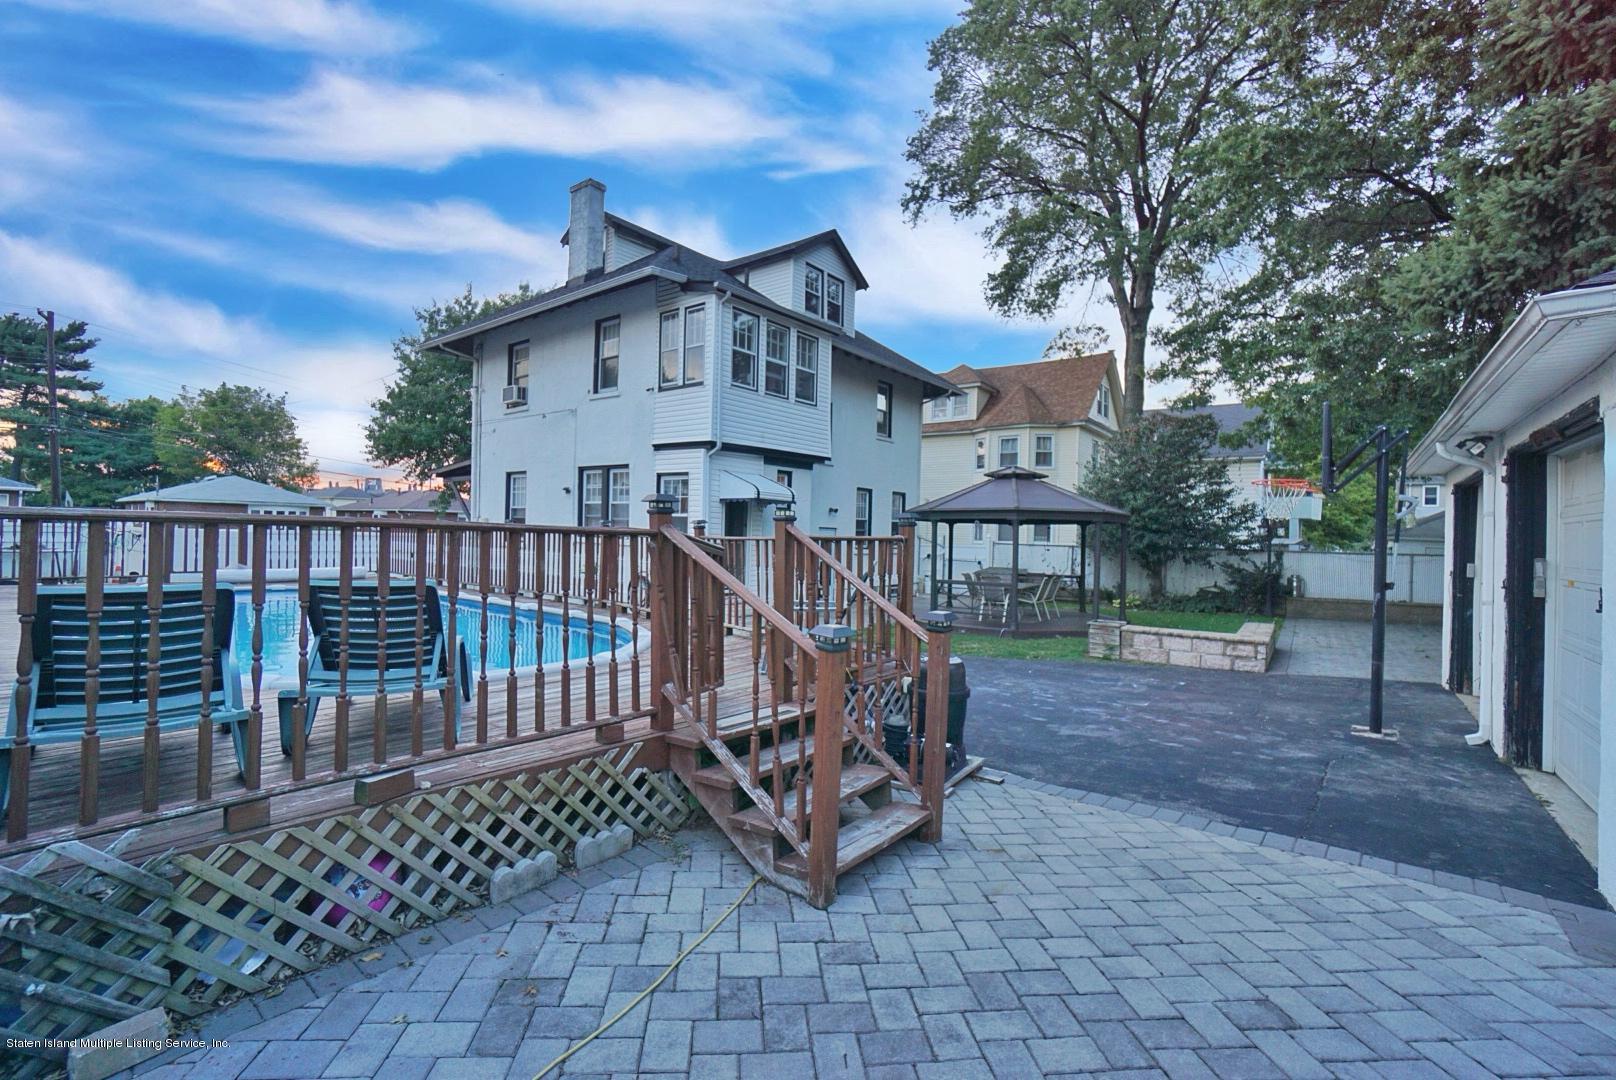 Single Family - Detached 31 Pelton Avenue  Staten Island, NY 10310, MLS-1132177-30